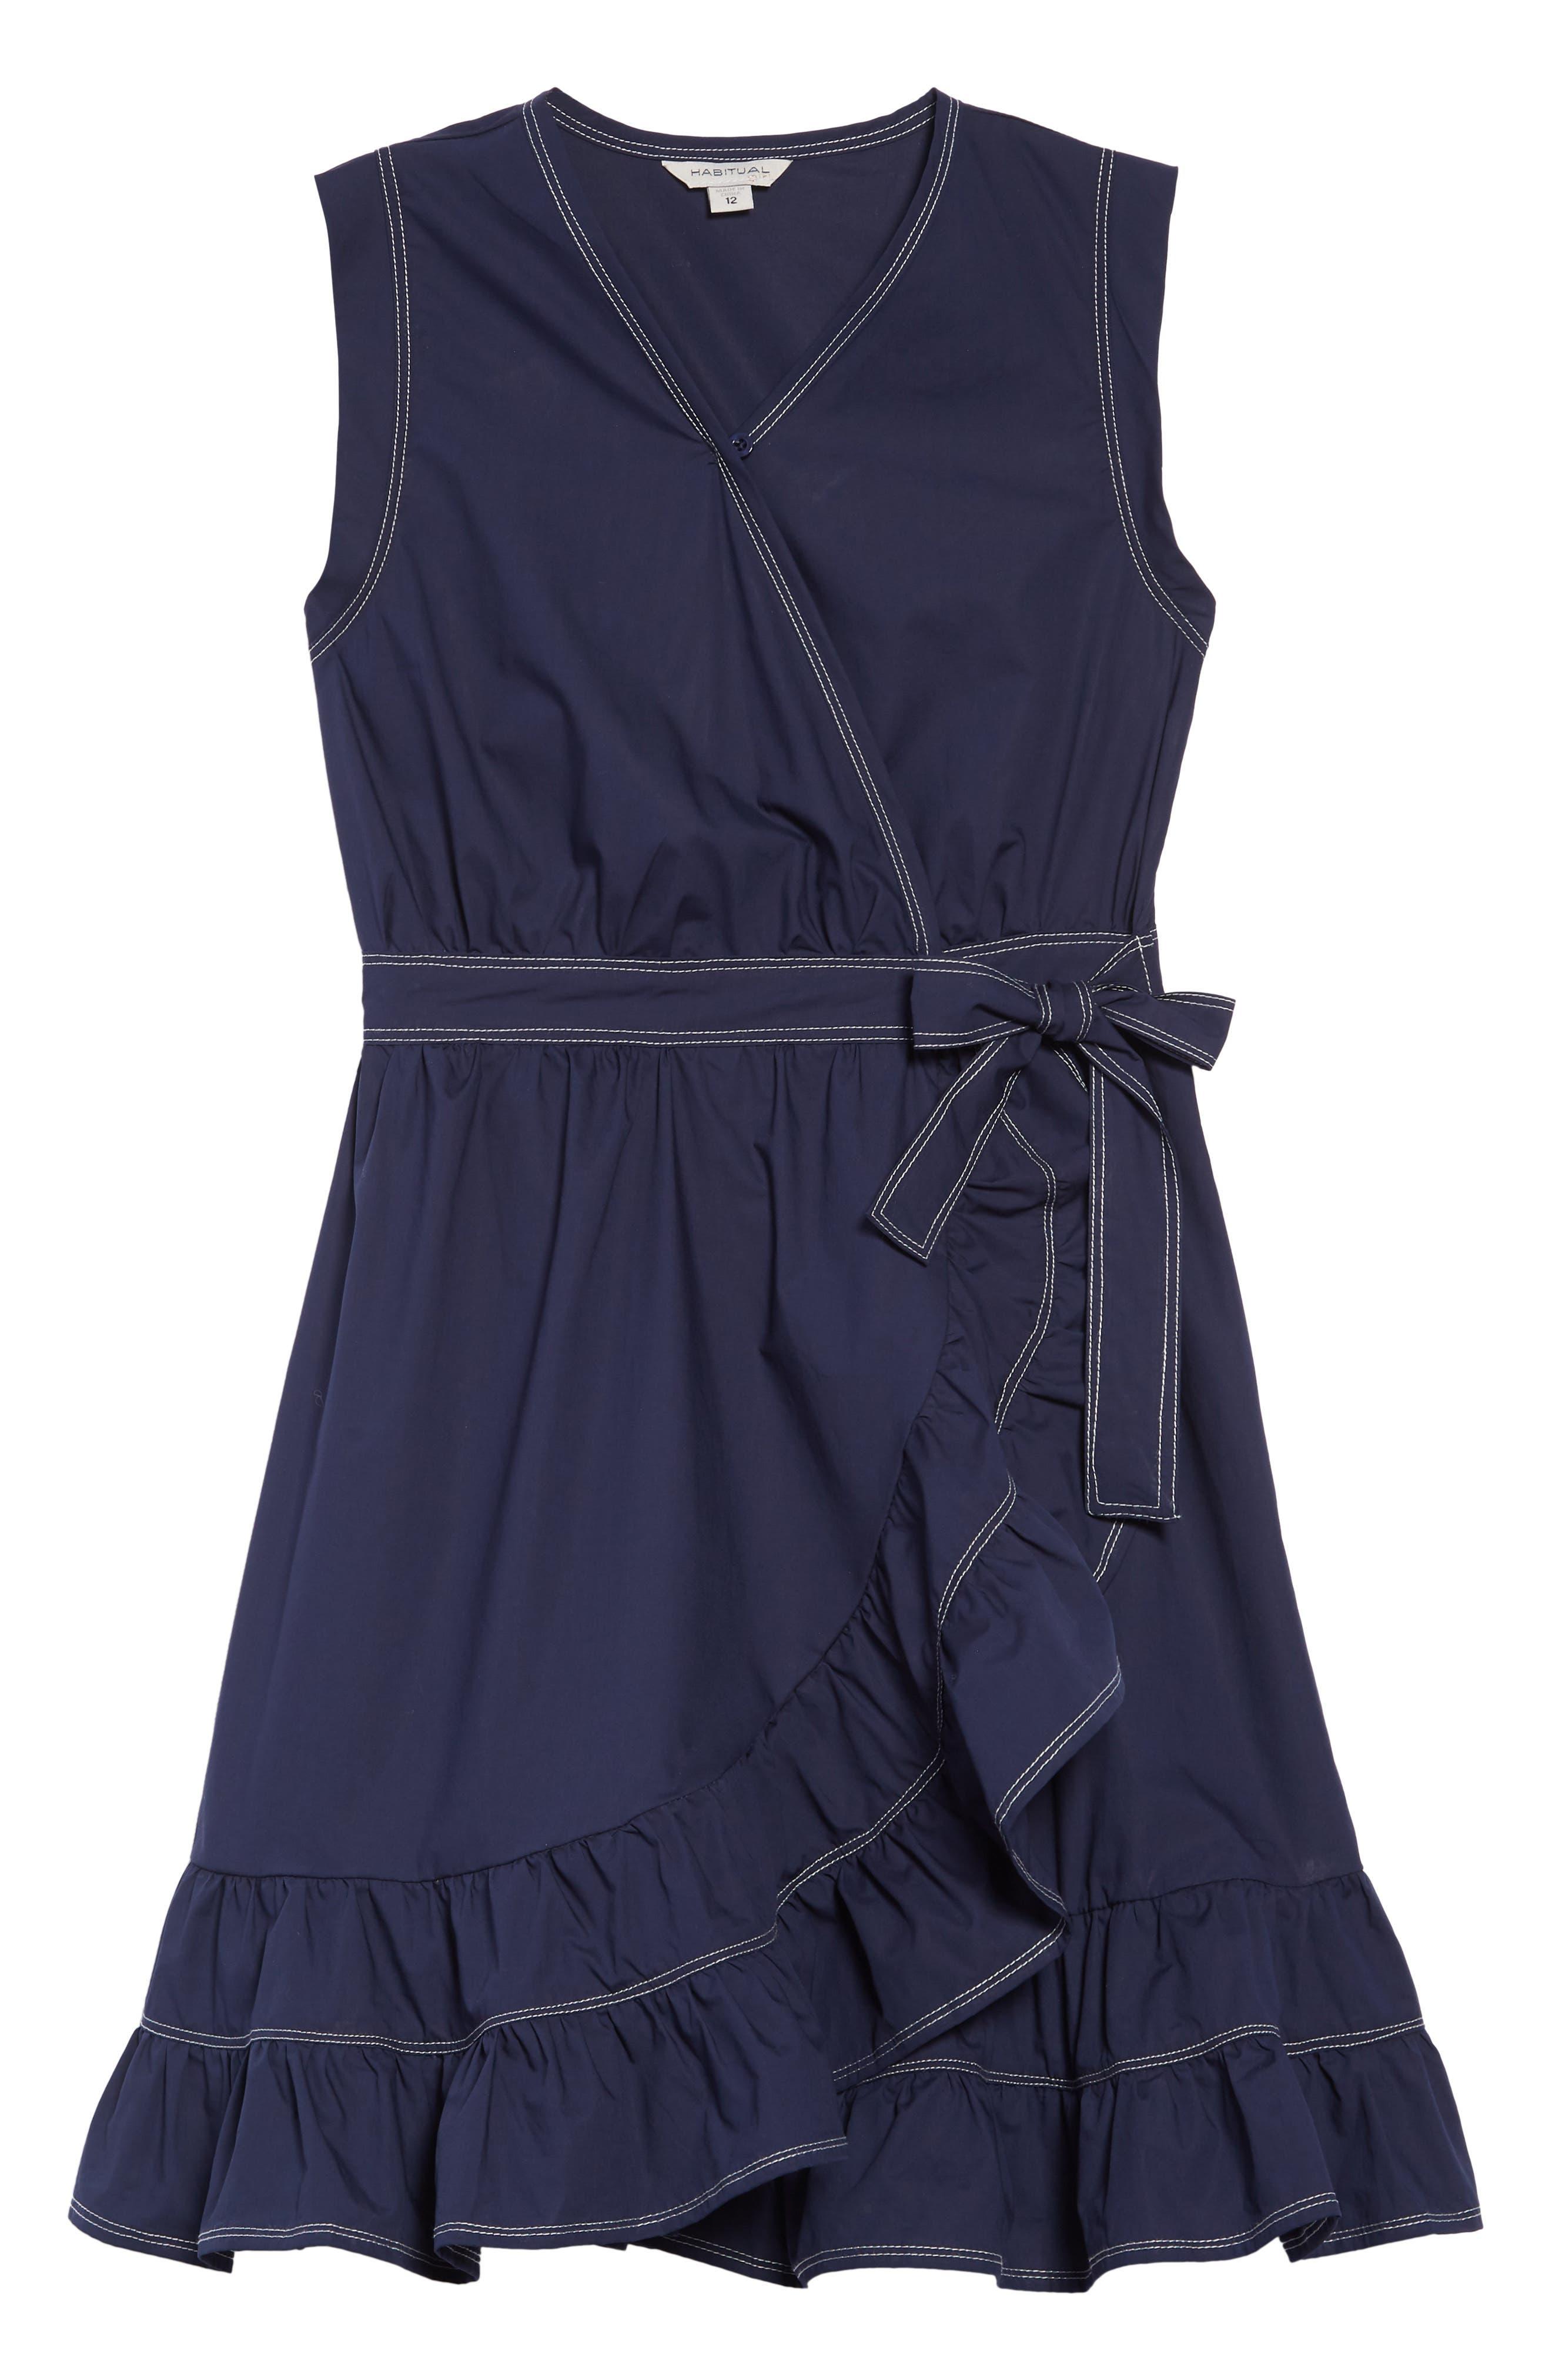 HABITUAL, Vanessa Wrap Dress, Main thumbnail 1, color, 410